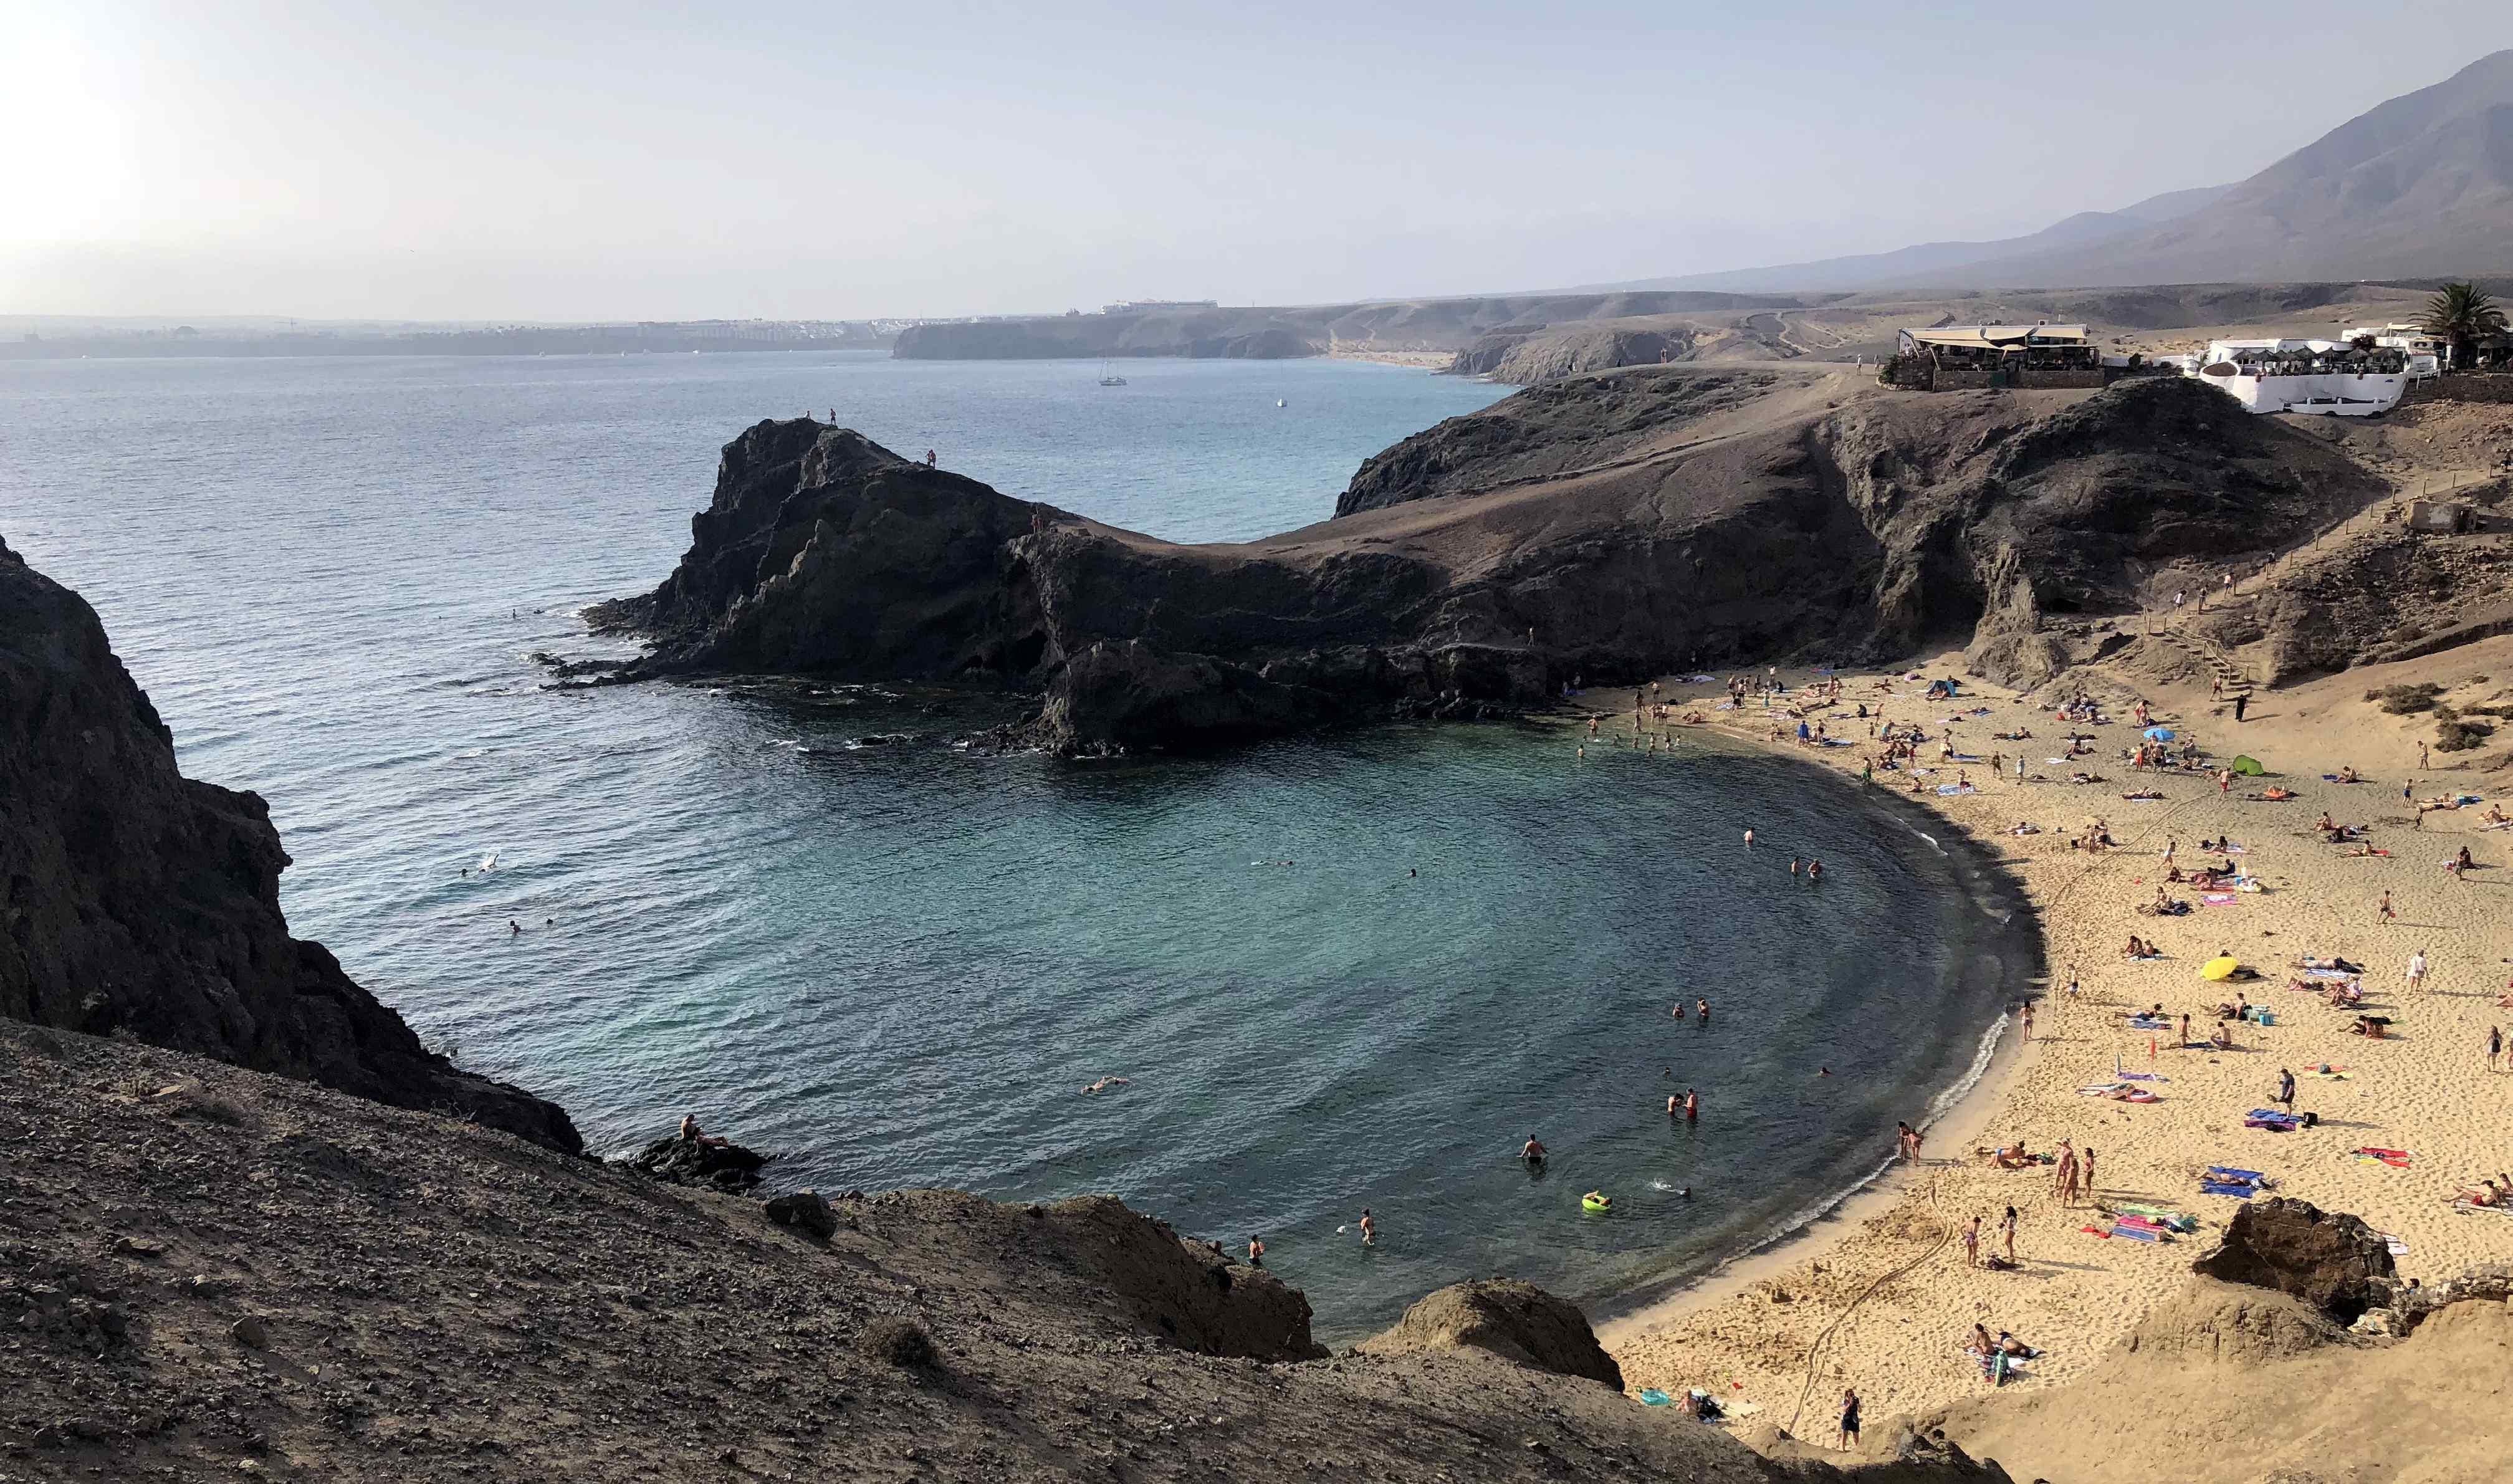 Lanzarote Sehenswürdigkeiten: Playa Papagayo